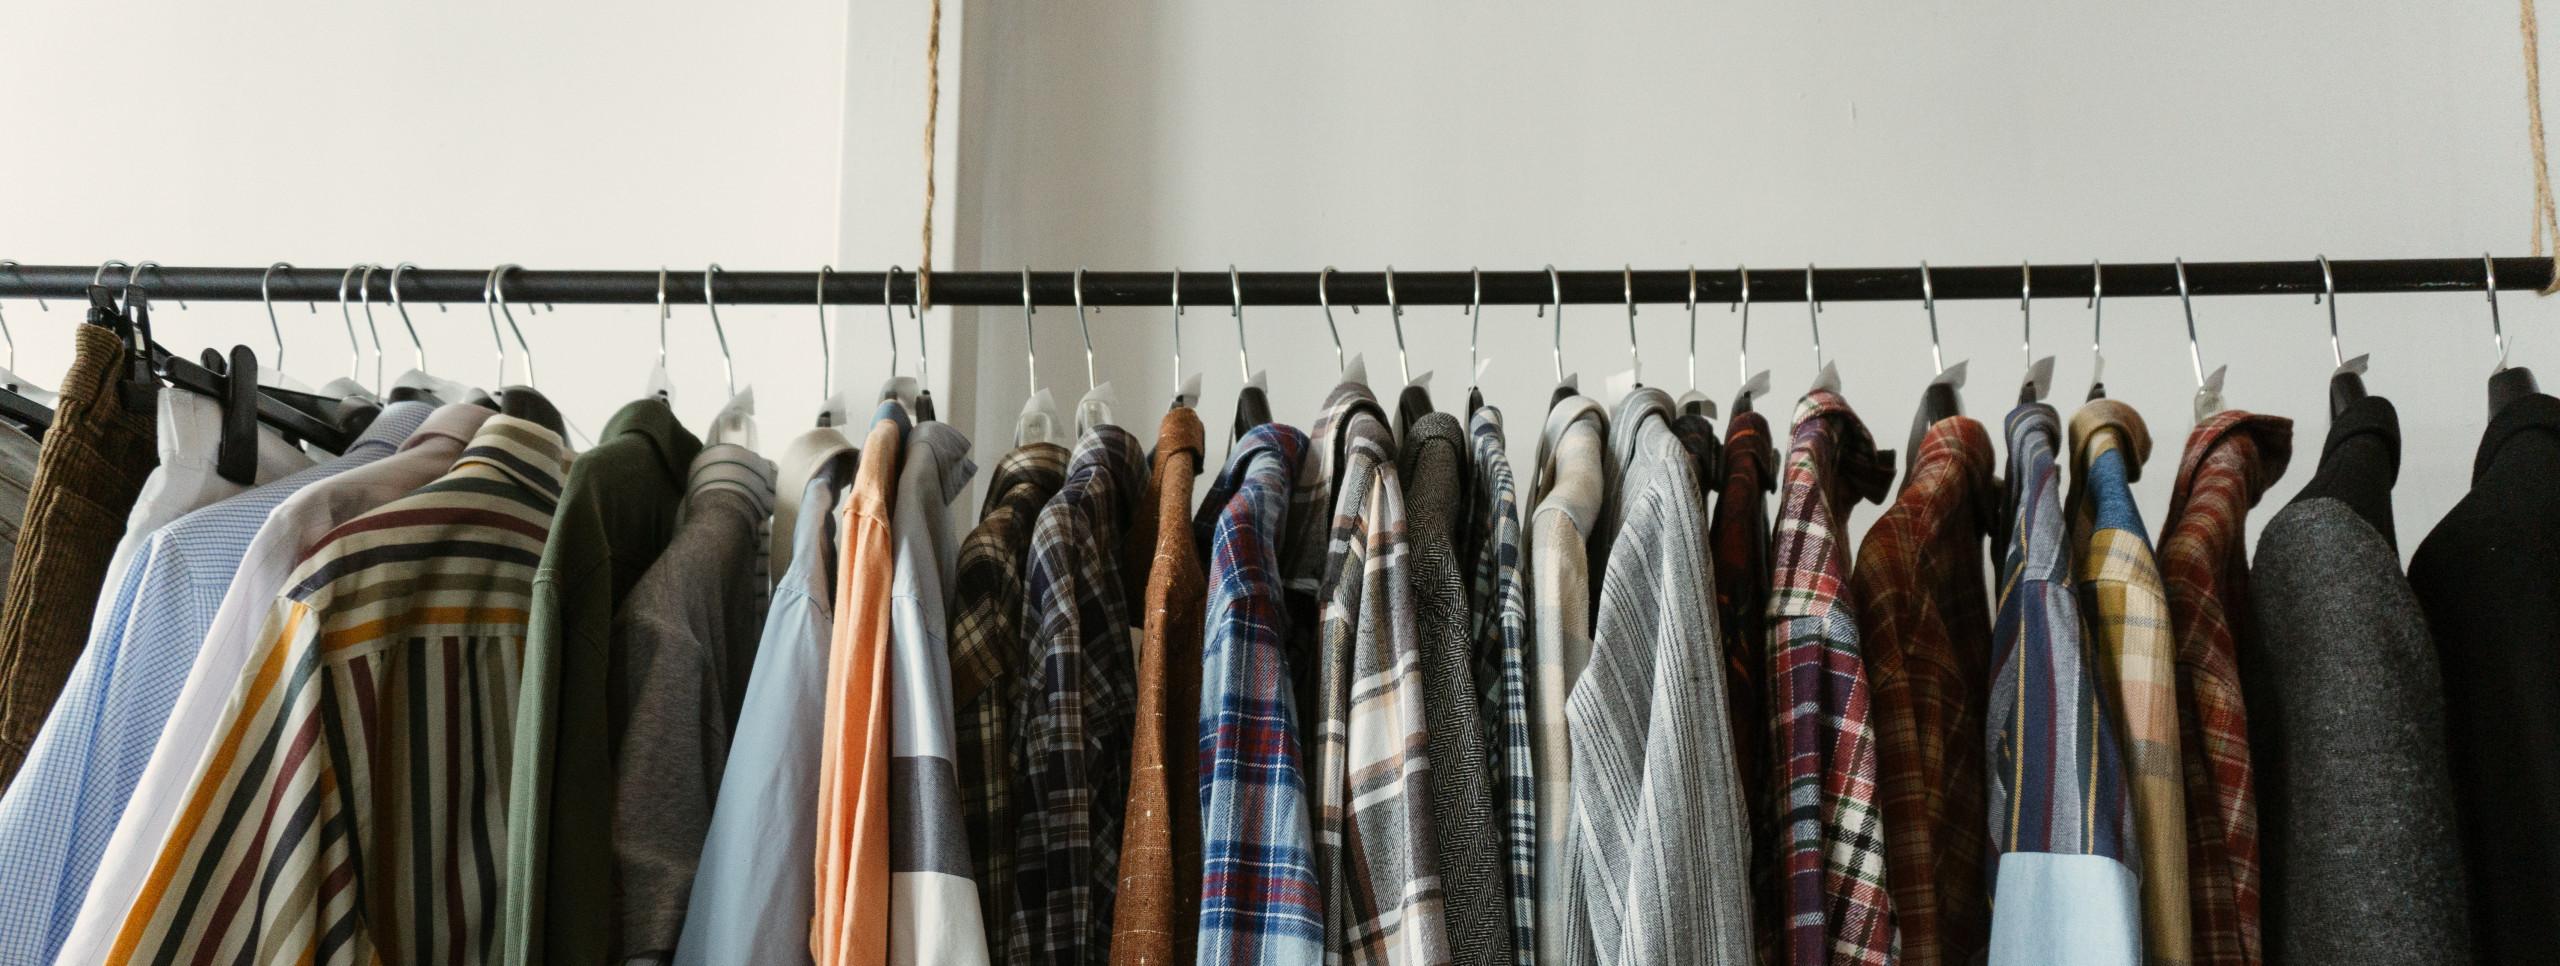 roupas-closet-armario-cabide-guarda-roupa-organizacao-organizar-dicas